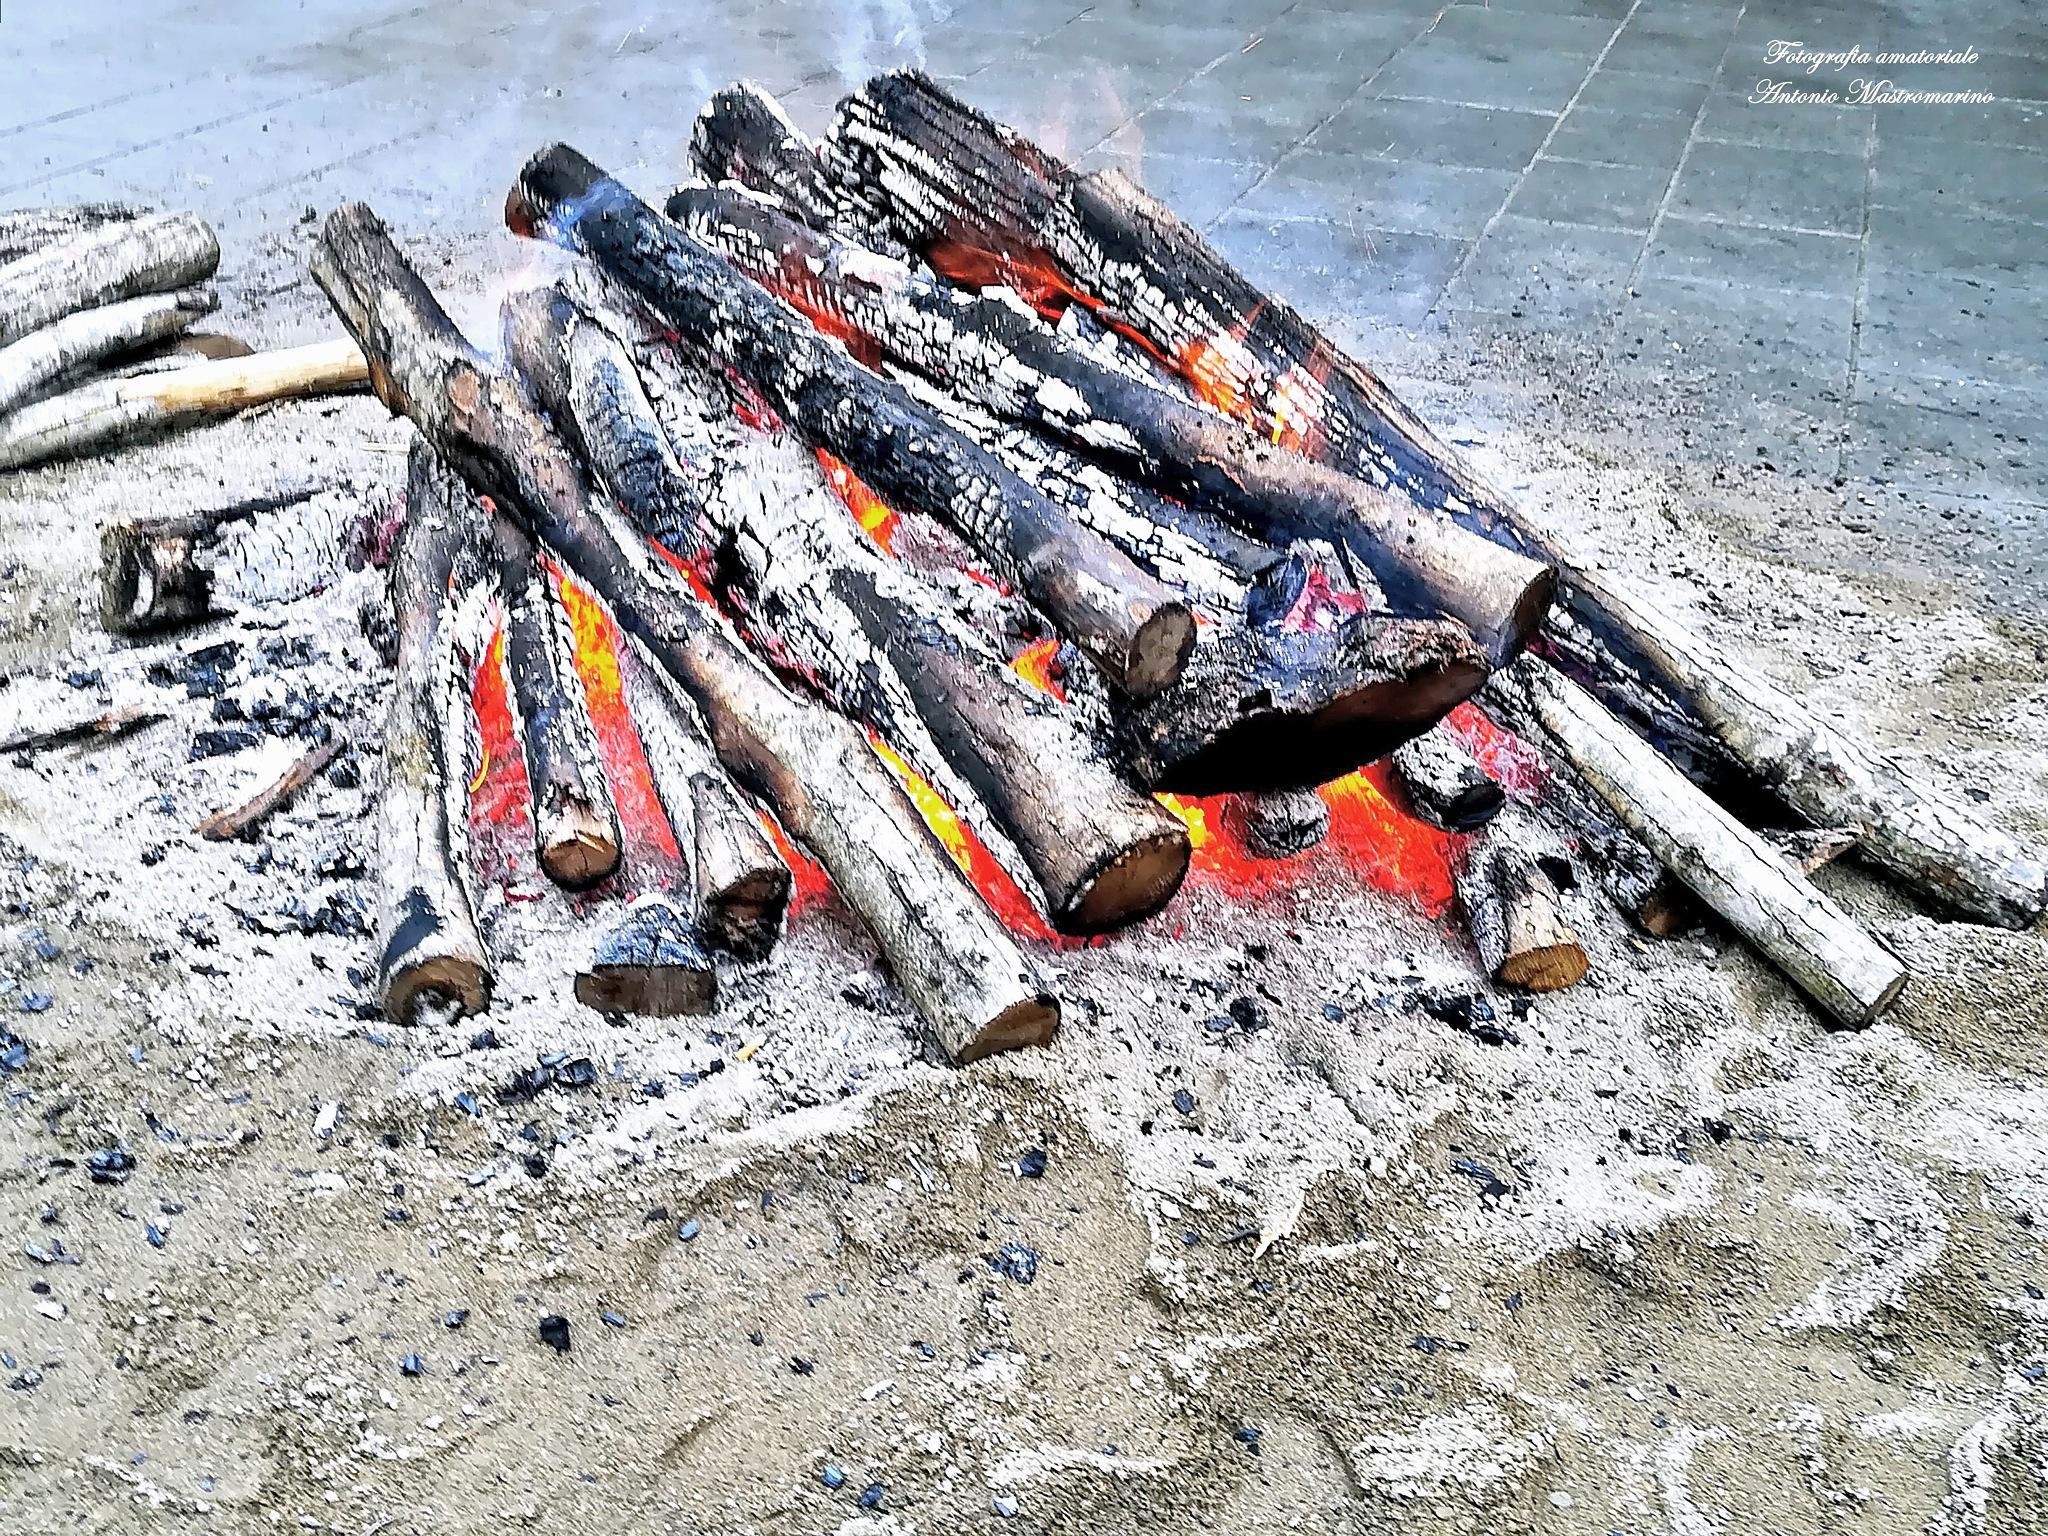 Fire by antonio mastromarino